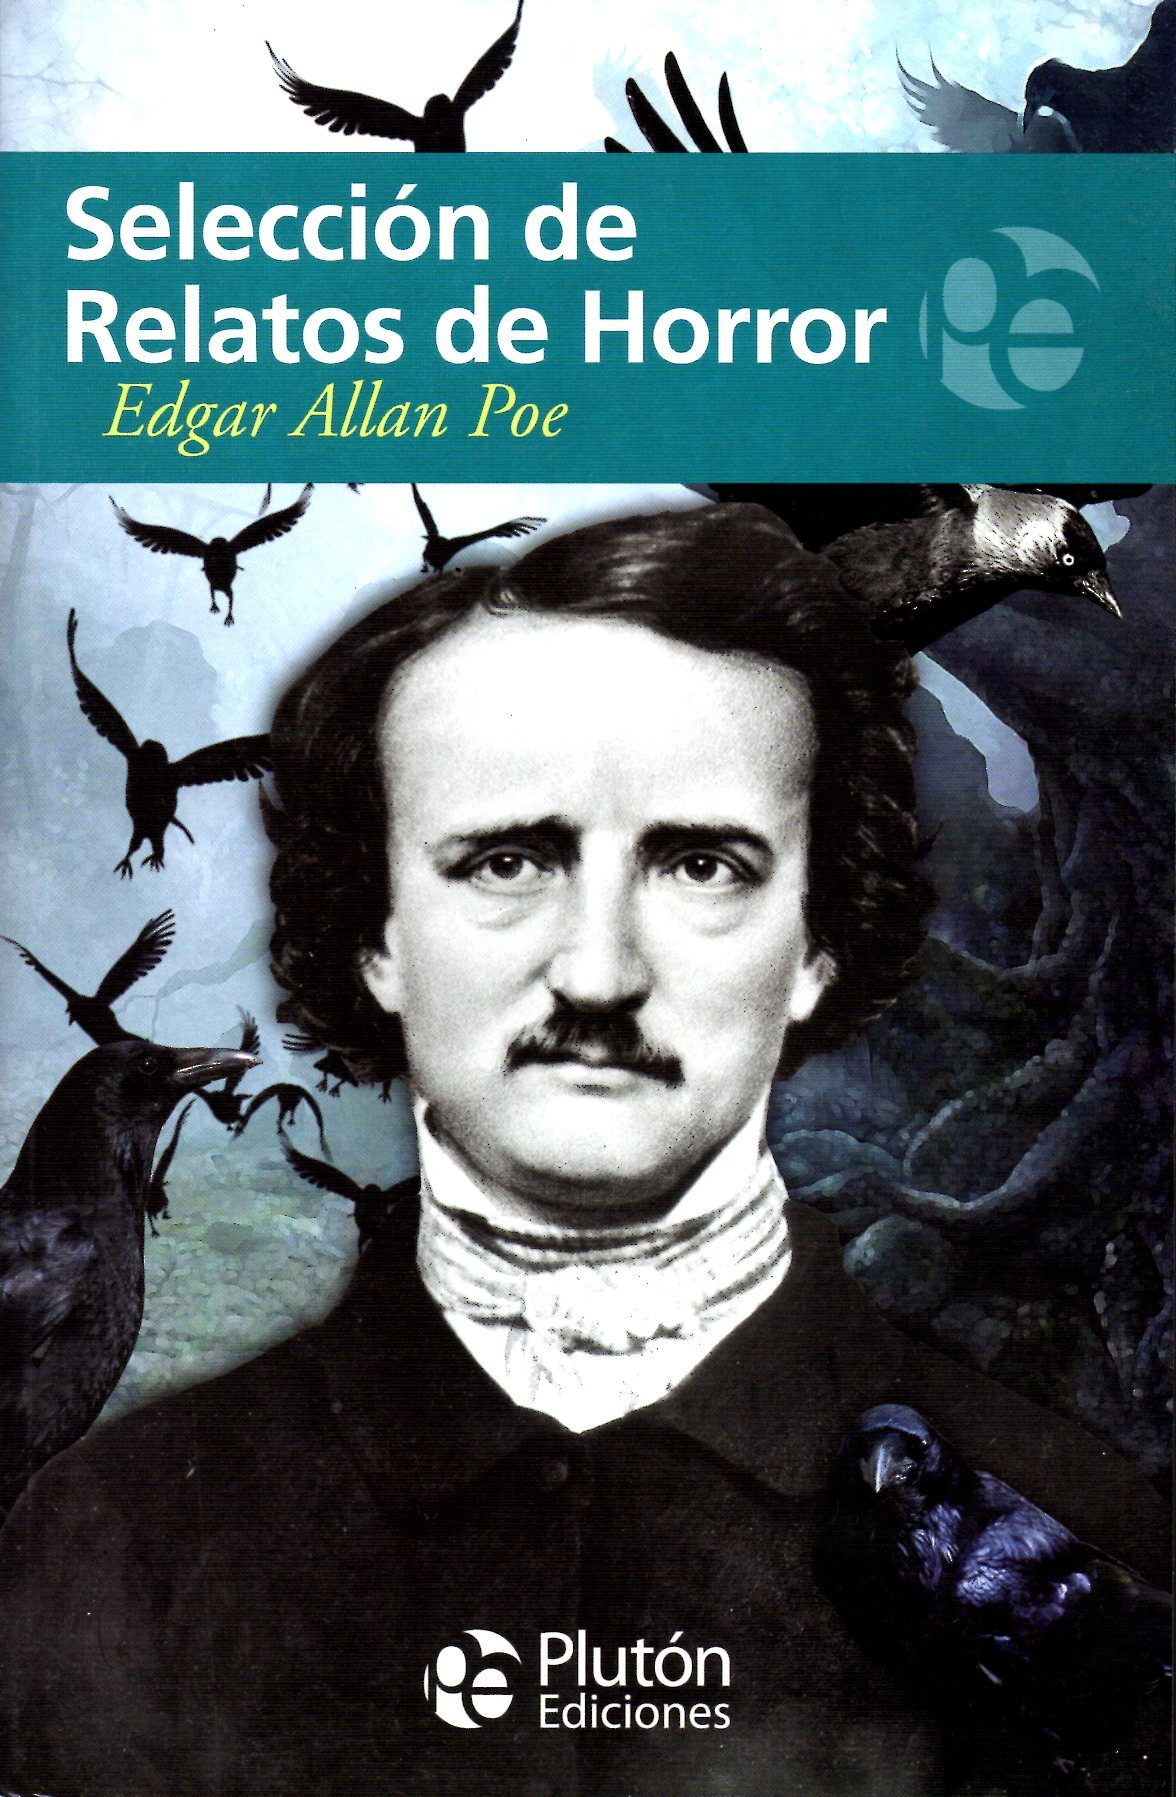 Libros de Edgar Allan Poe en PDF